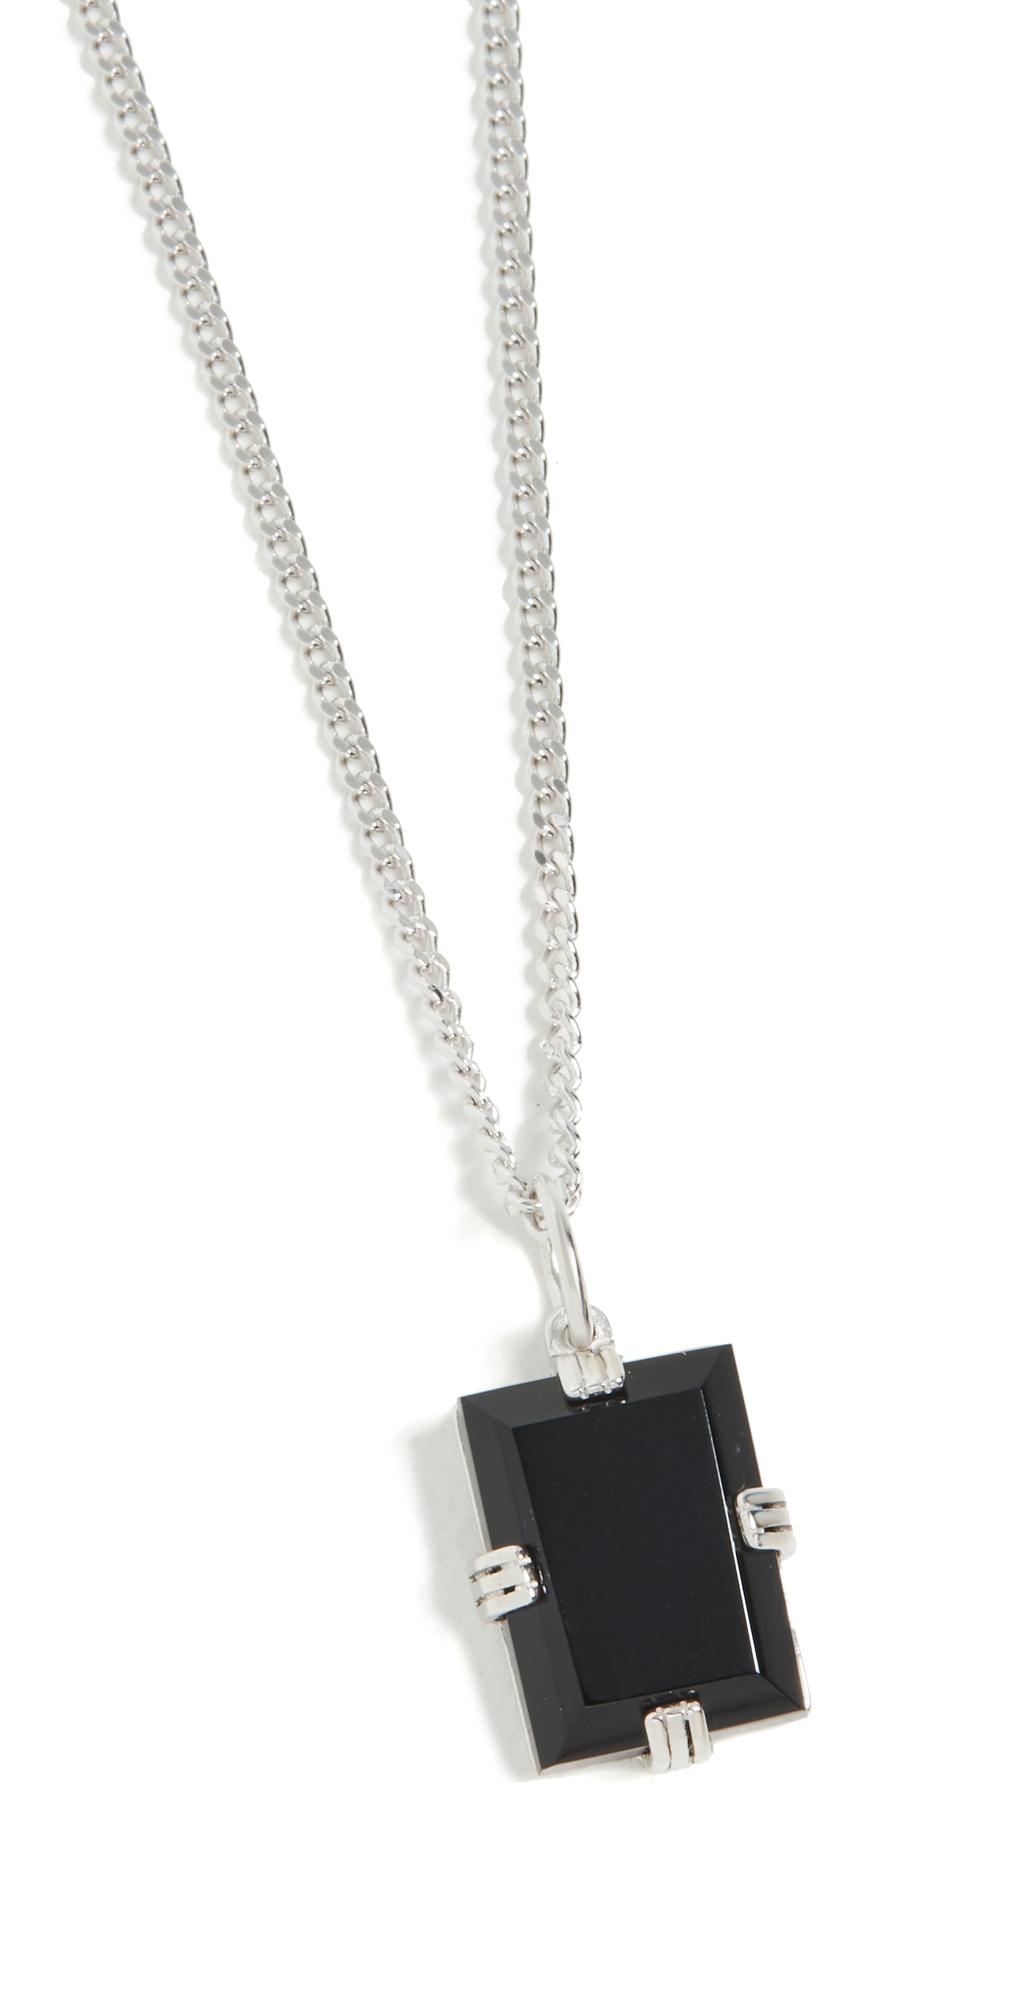 Lennox Onyx Chain Necklace